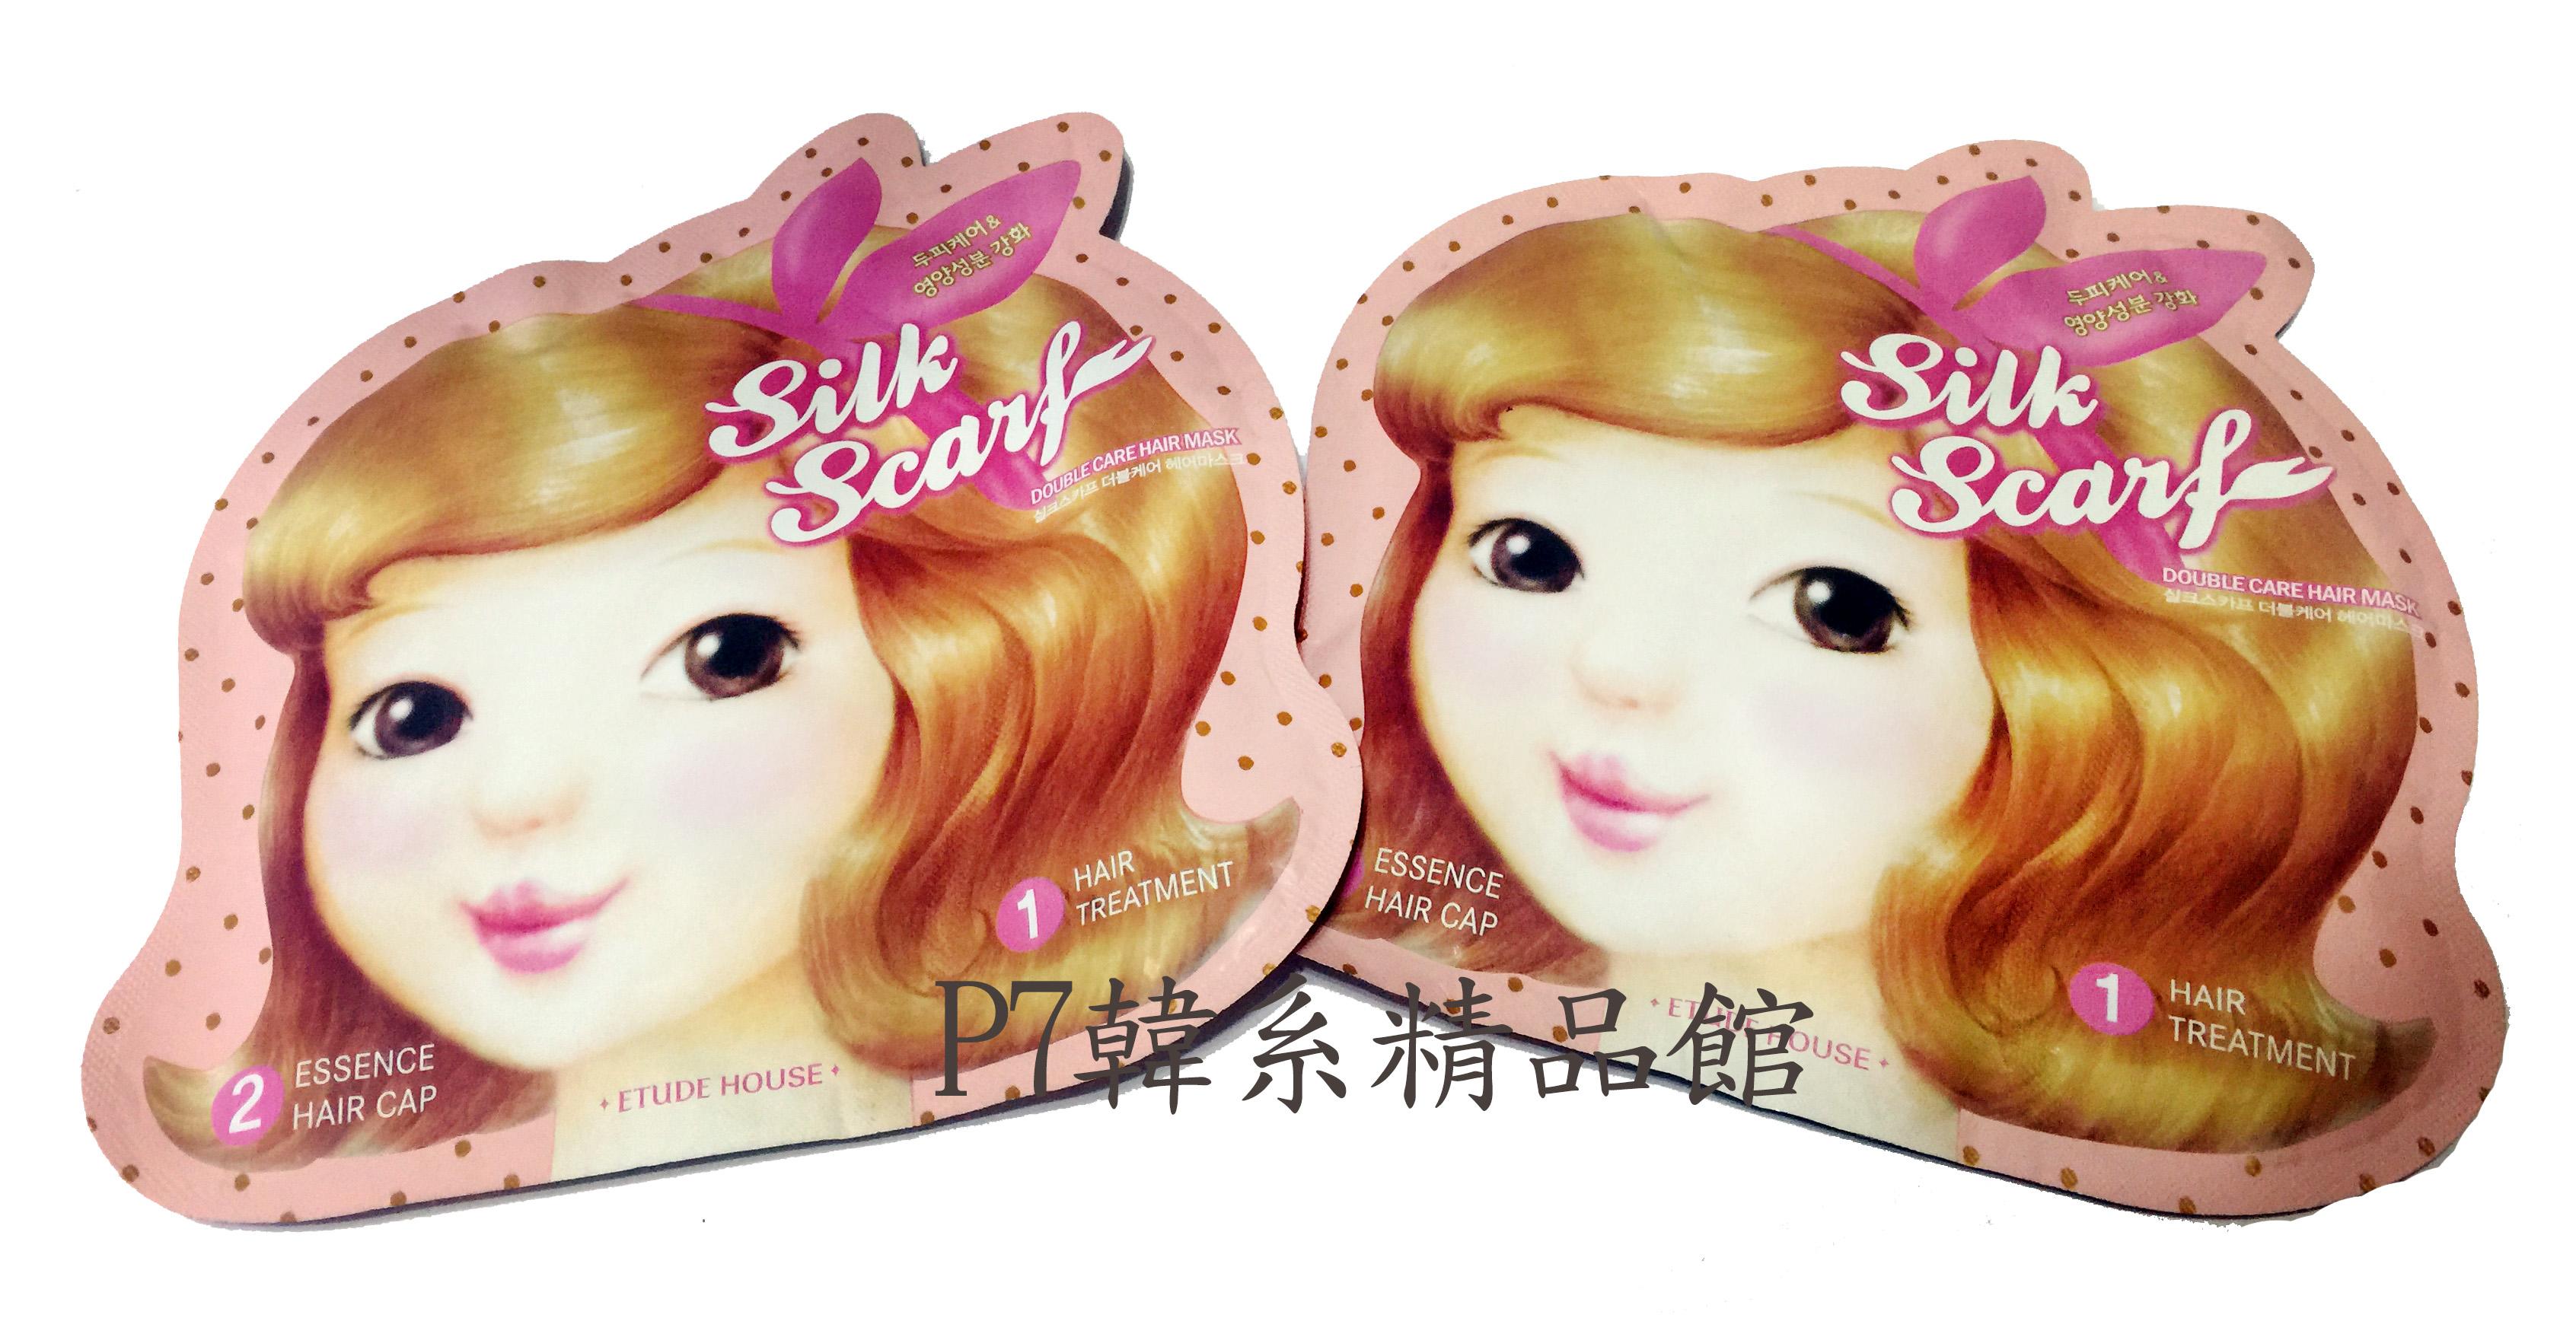 ETUDE HOUSE愛麗小屋甜心香吻雙重修護寶貝髮膜蠶絲精華修復髮膜shinee代言改善毛躁染燙受損護理